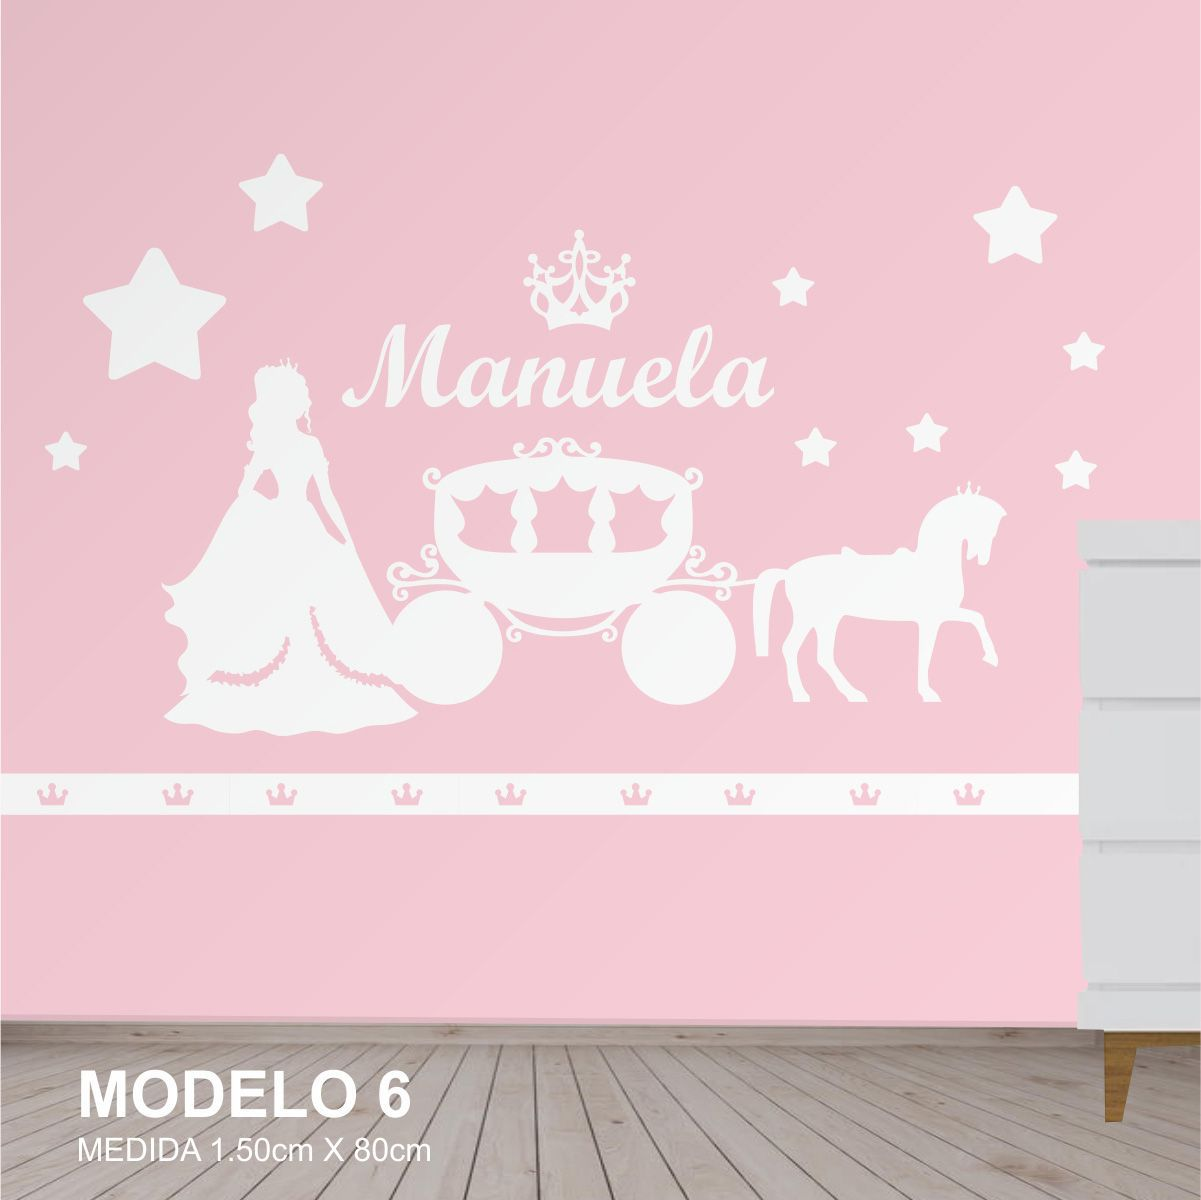 Painel Decorativo Quarto Infantil Princesa Carruagem Mdf